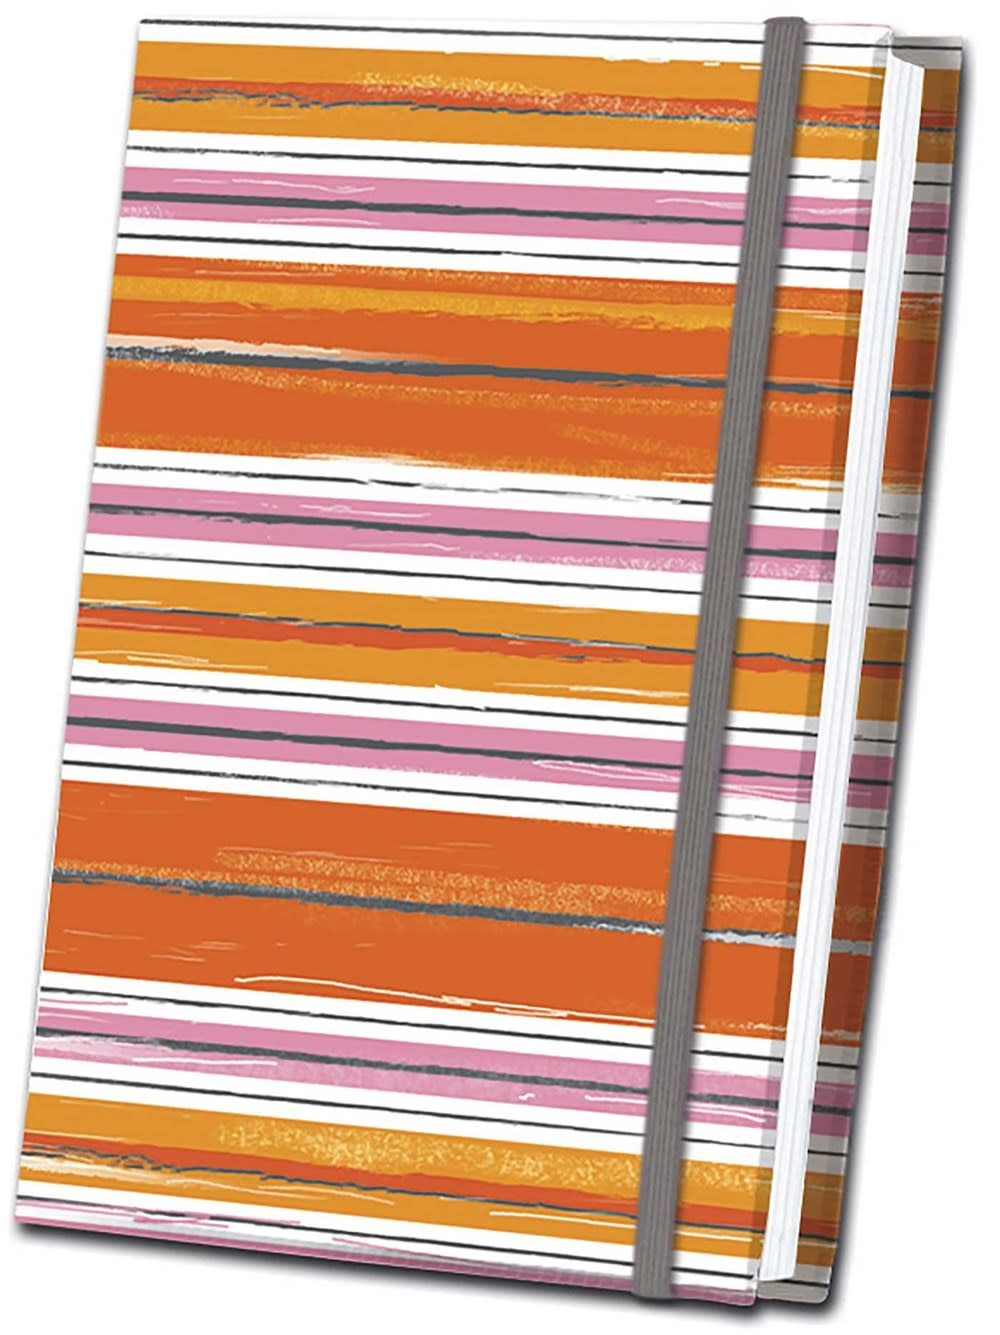 Thunder Bay Press Orange Striped Fabric Journal